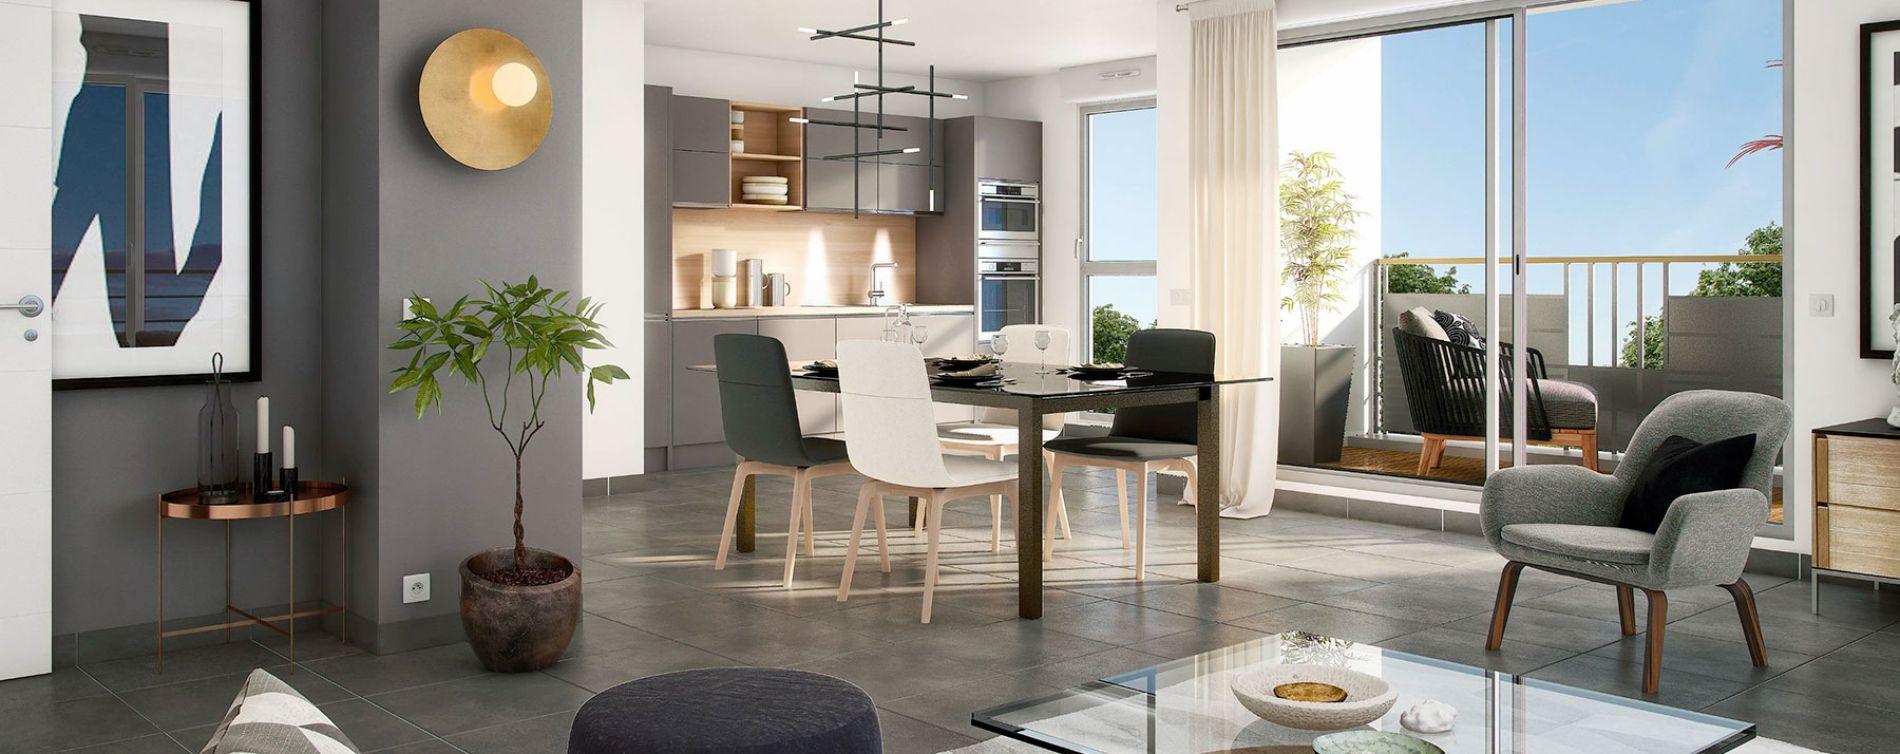 Savigny-sur-Orge : programme immobilier neuve « Le Savini » (3)